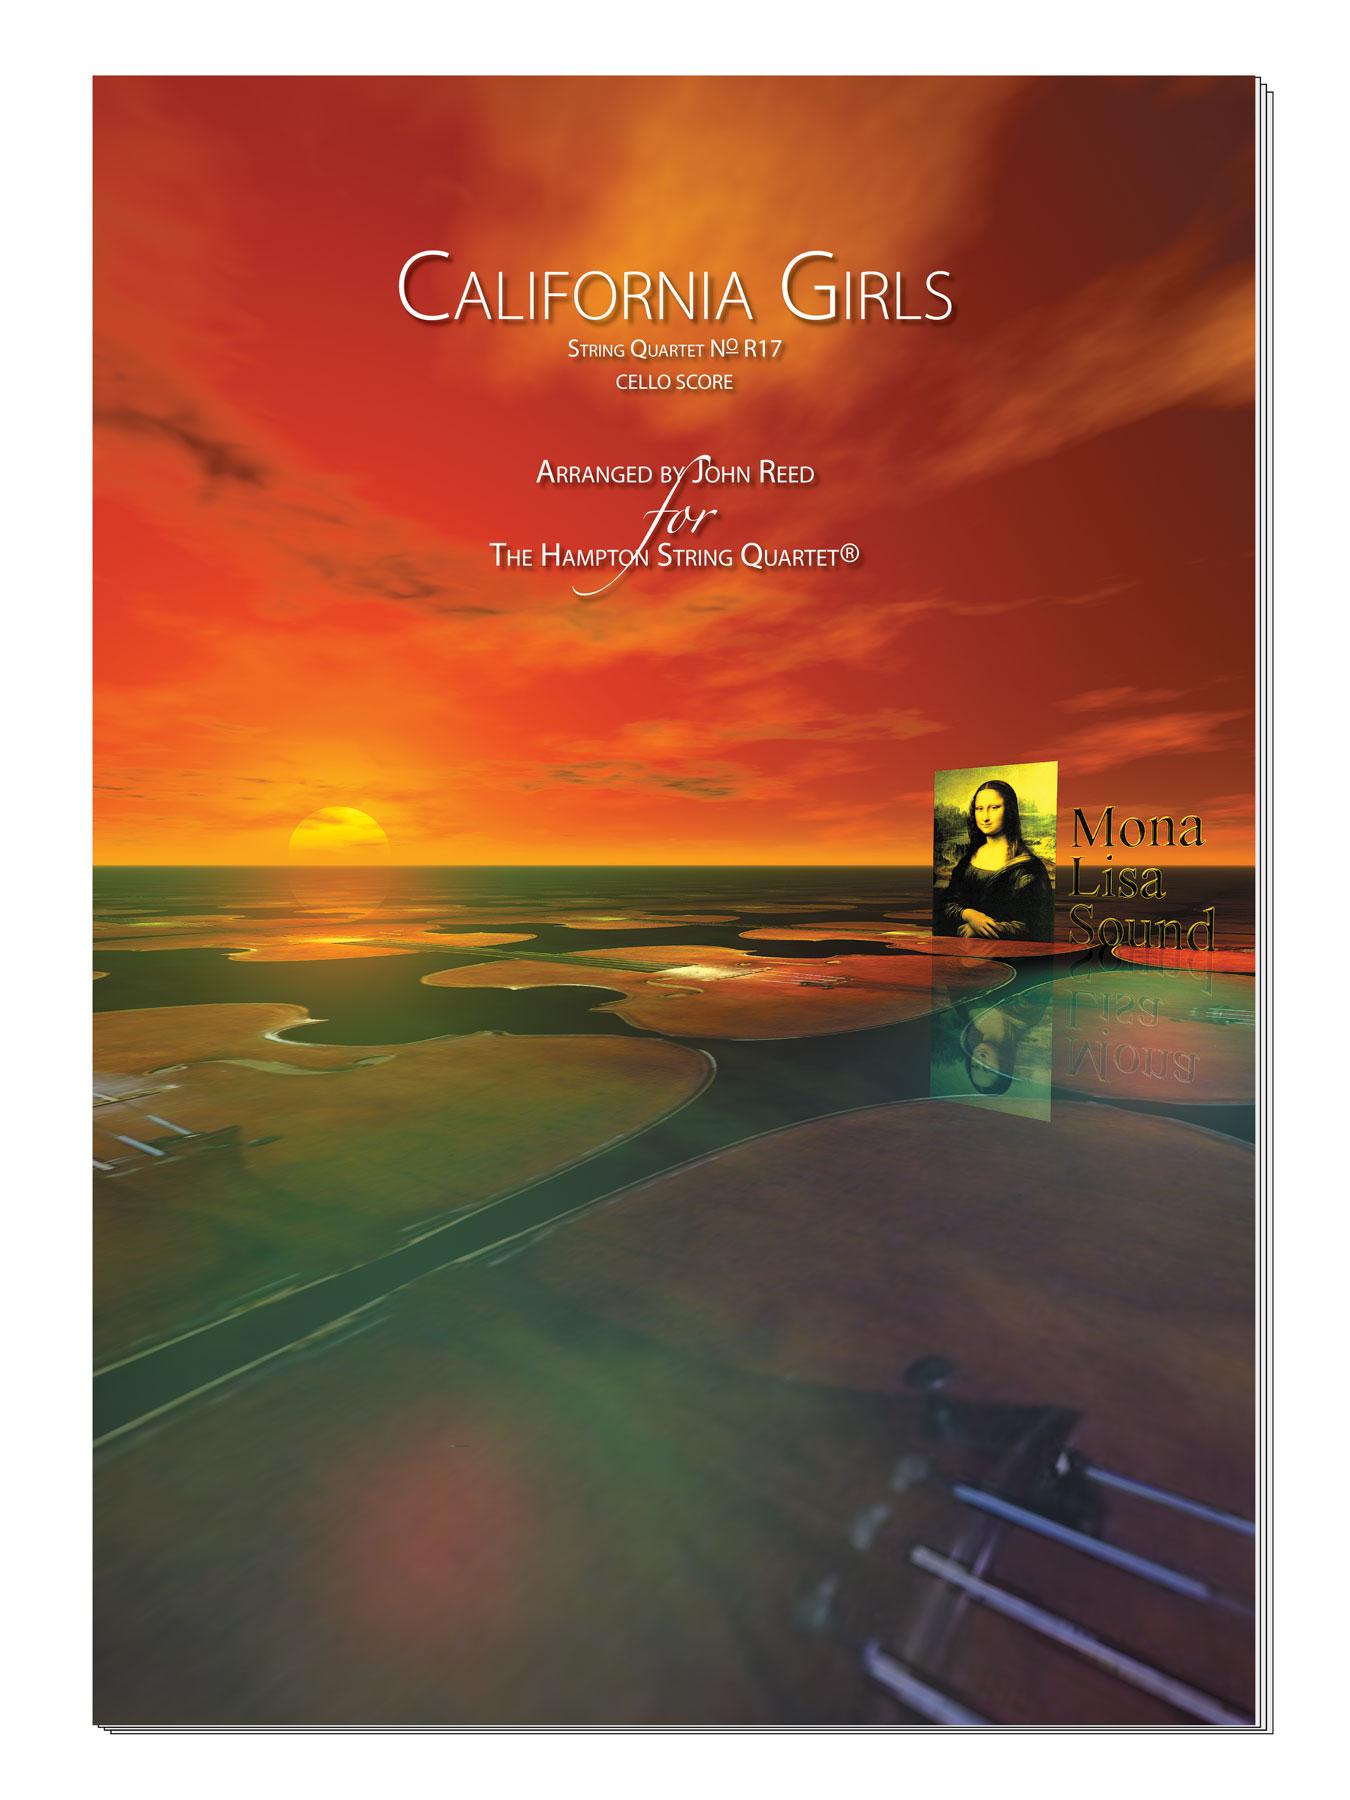 CaliforniaGirls.jpg